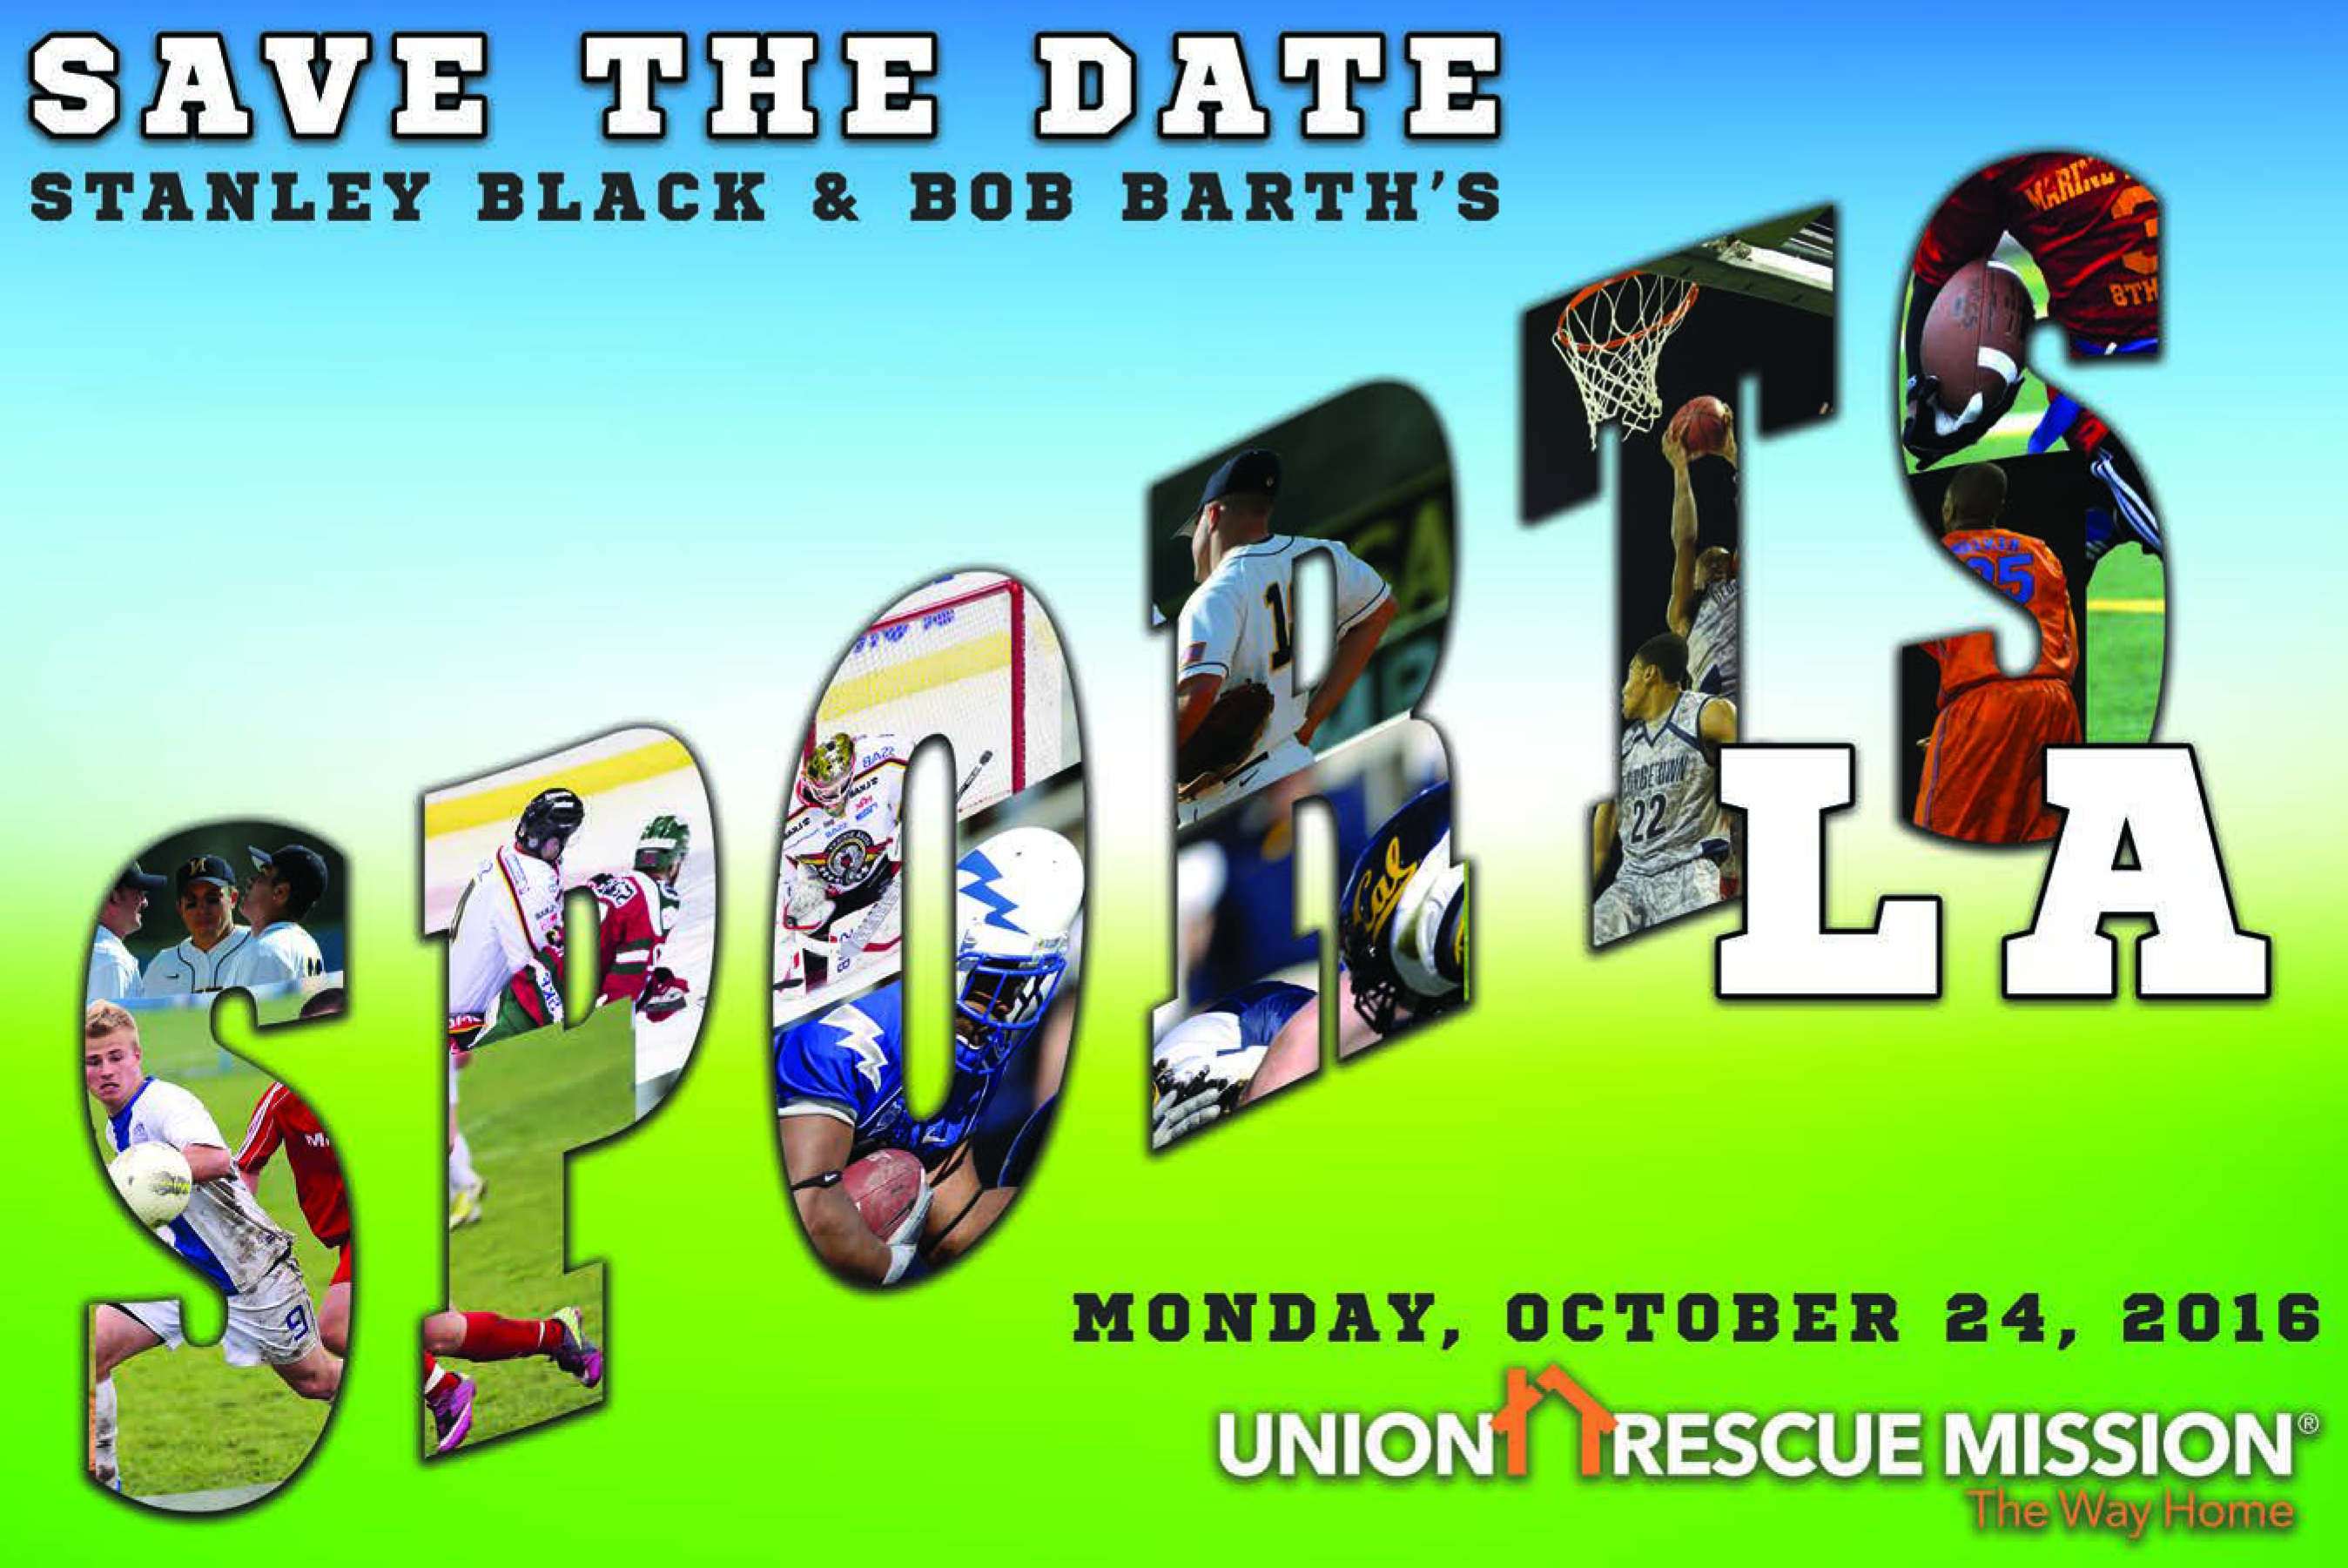 Save the Date, Sports LA